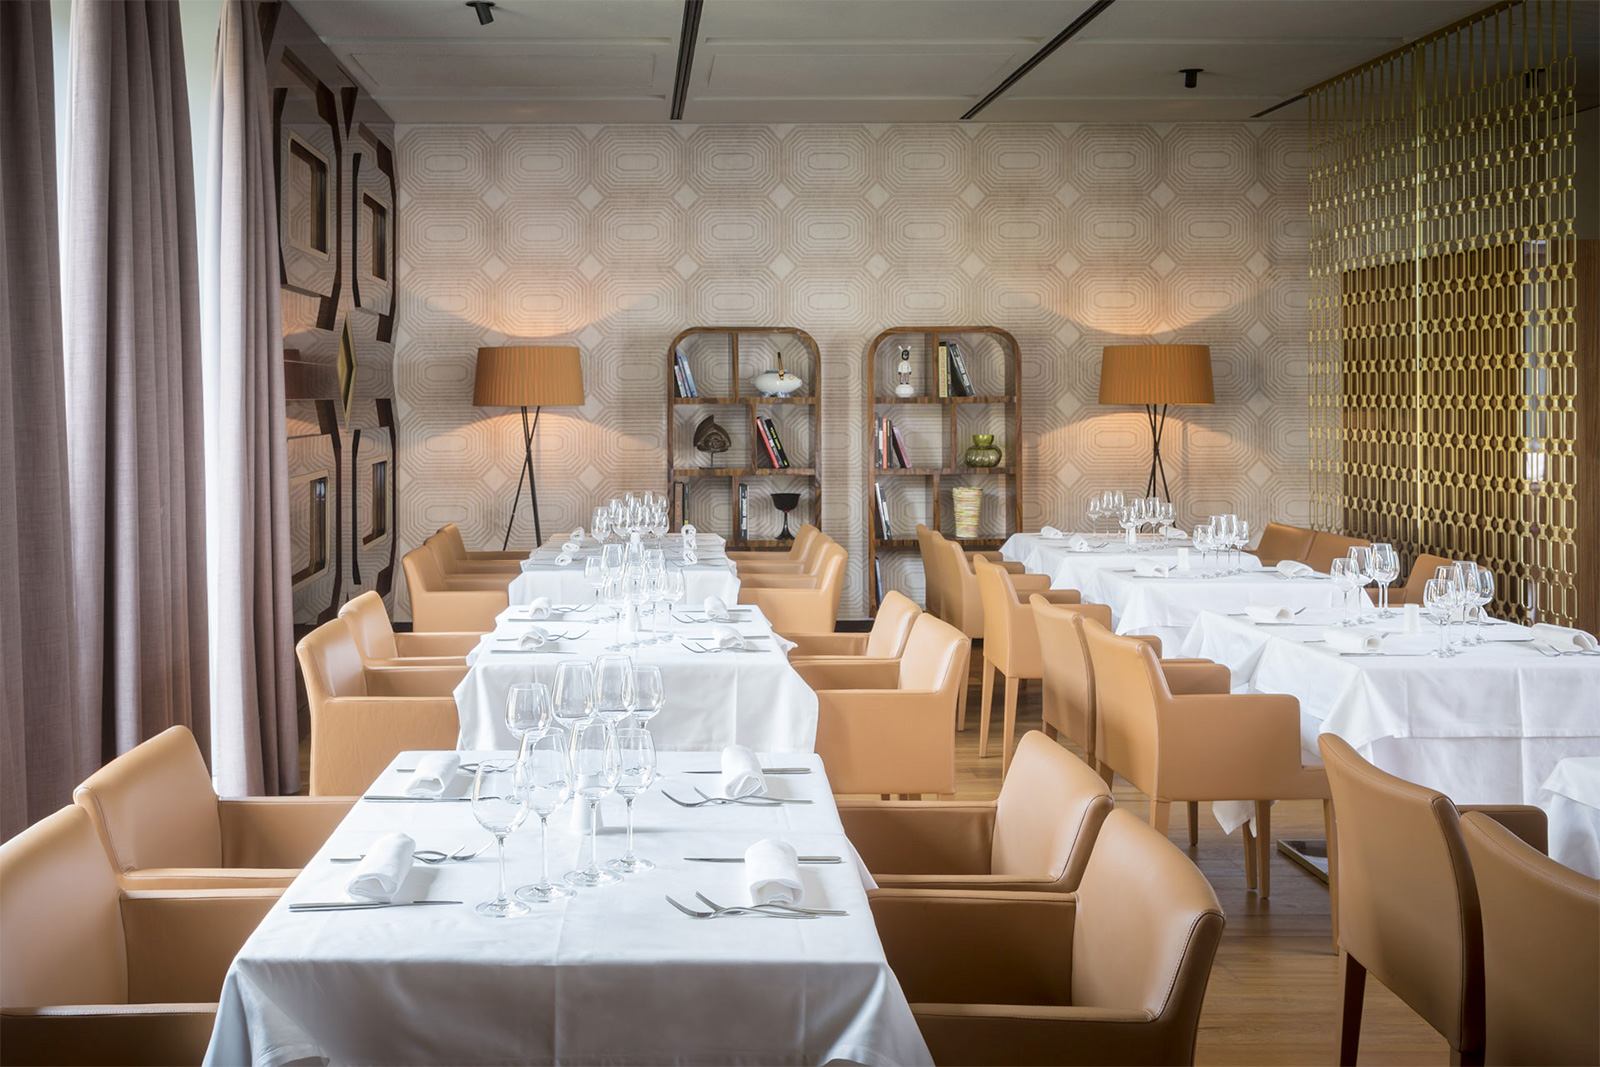 Photography: Vincenzo Bruno Courtesy of Mudec Restaurant